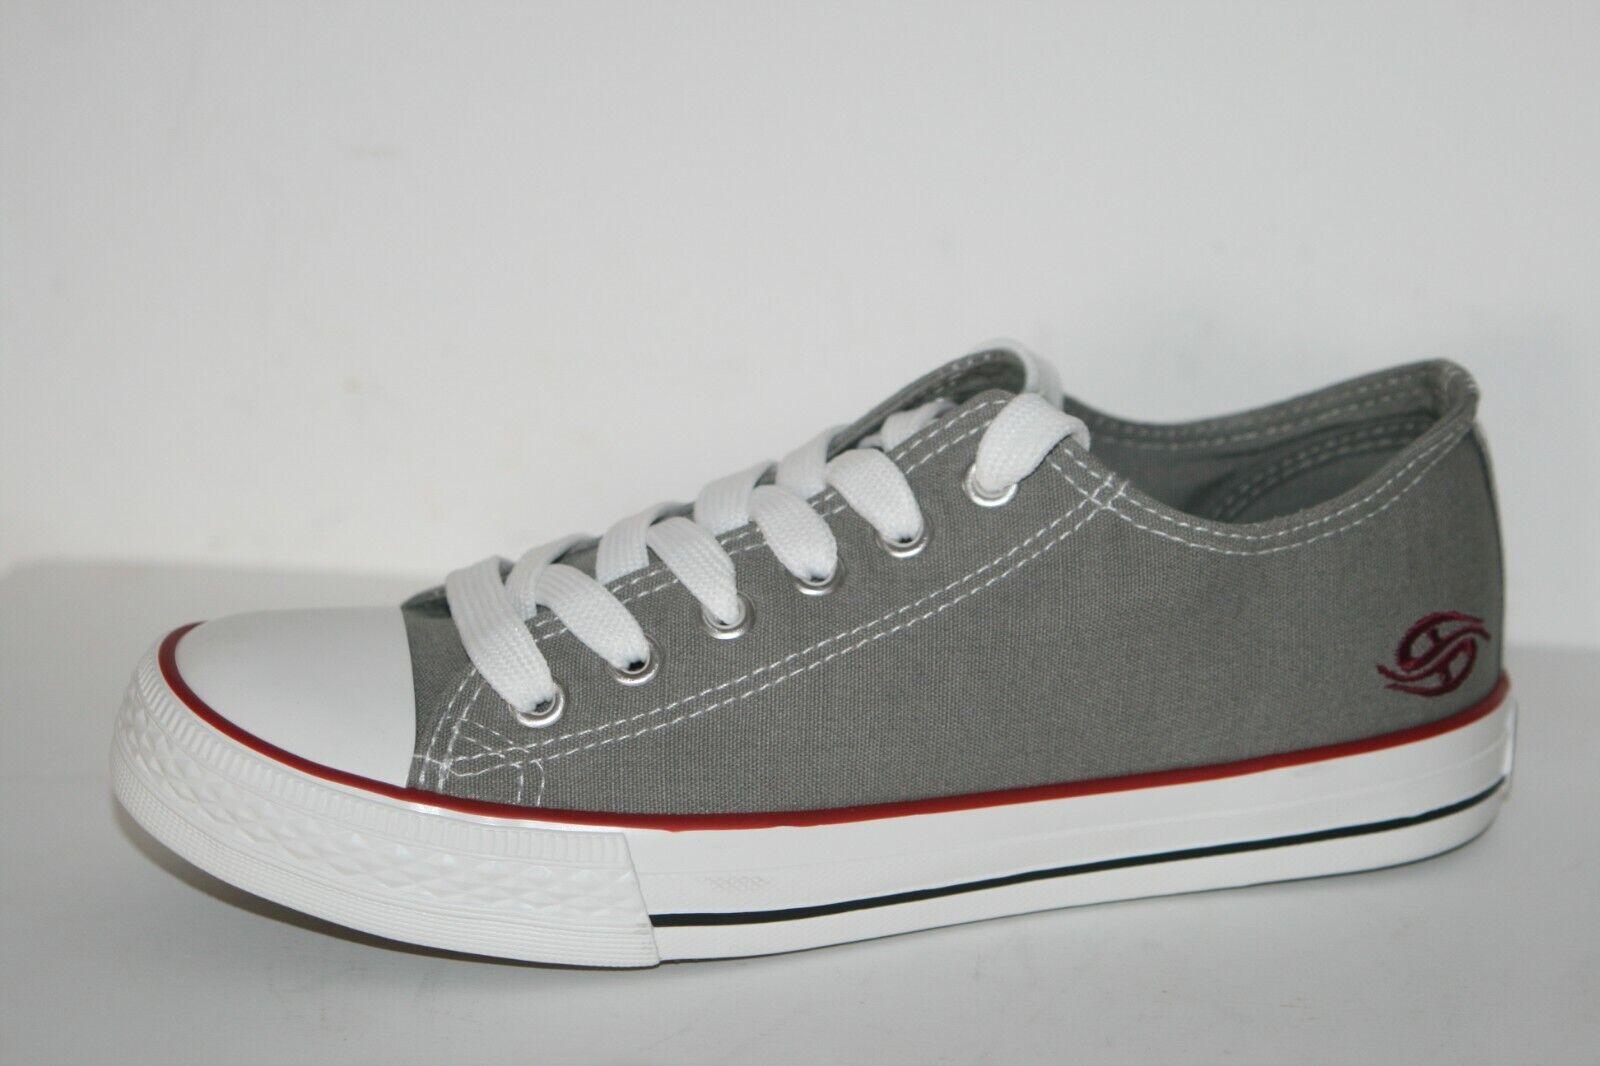 Dockers sportliche Damen Sneakers grau Schuhe Turnschuhe Stoffschuhe Canvas